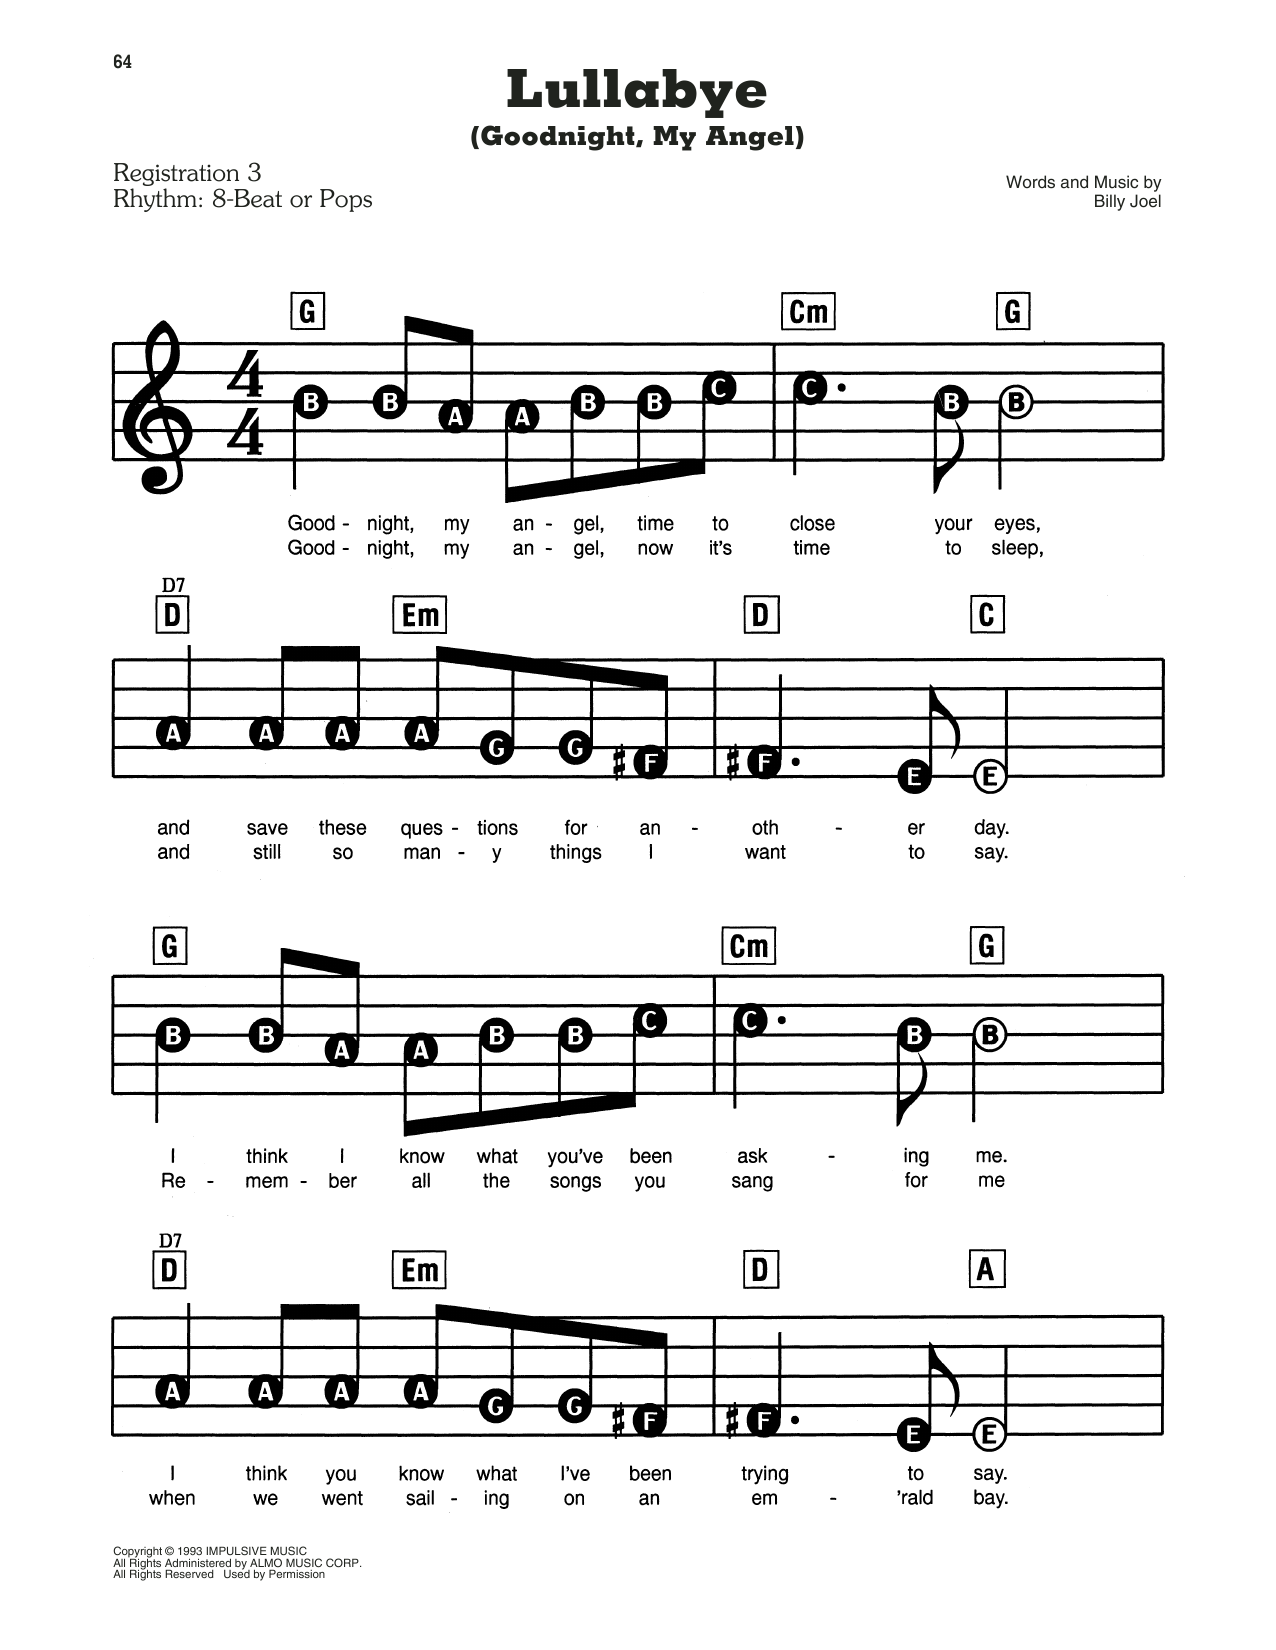 Lullabye (Goodnight, My Angel) Sheet Music